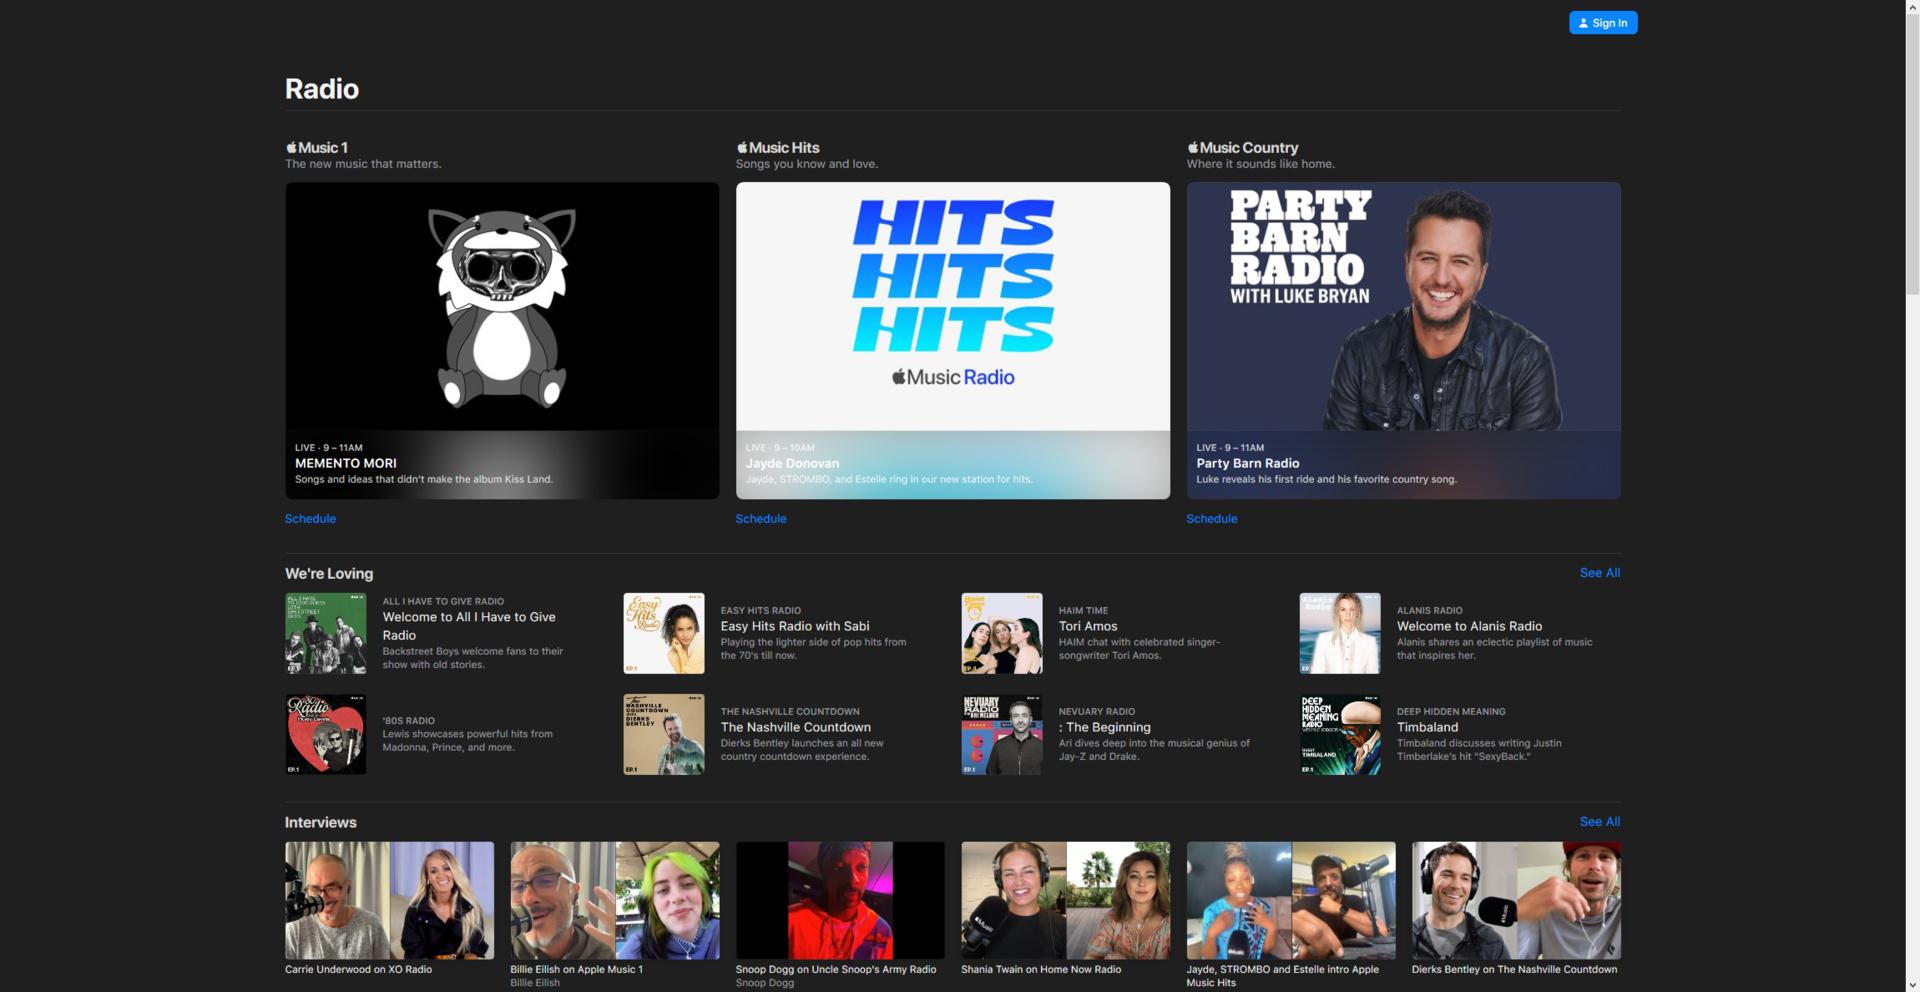 Apple Music Radio umfasst ab sofort drei Live-Radiosender